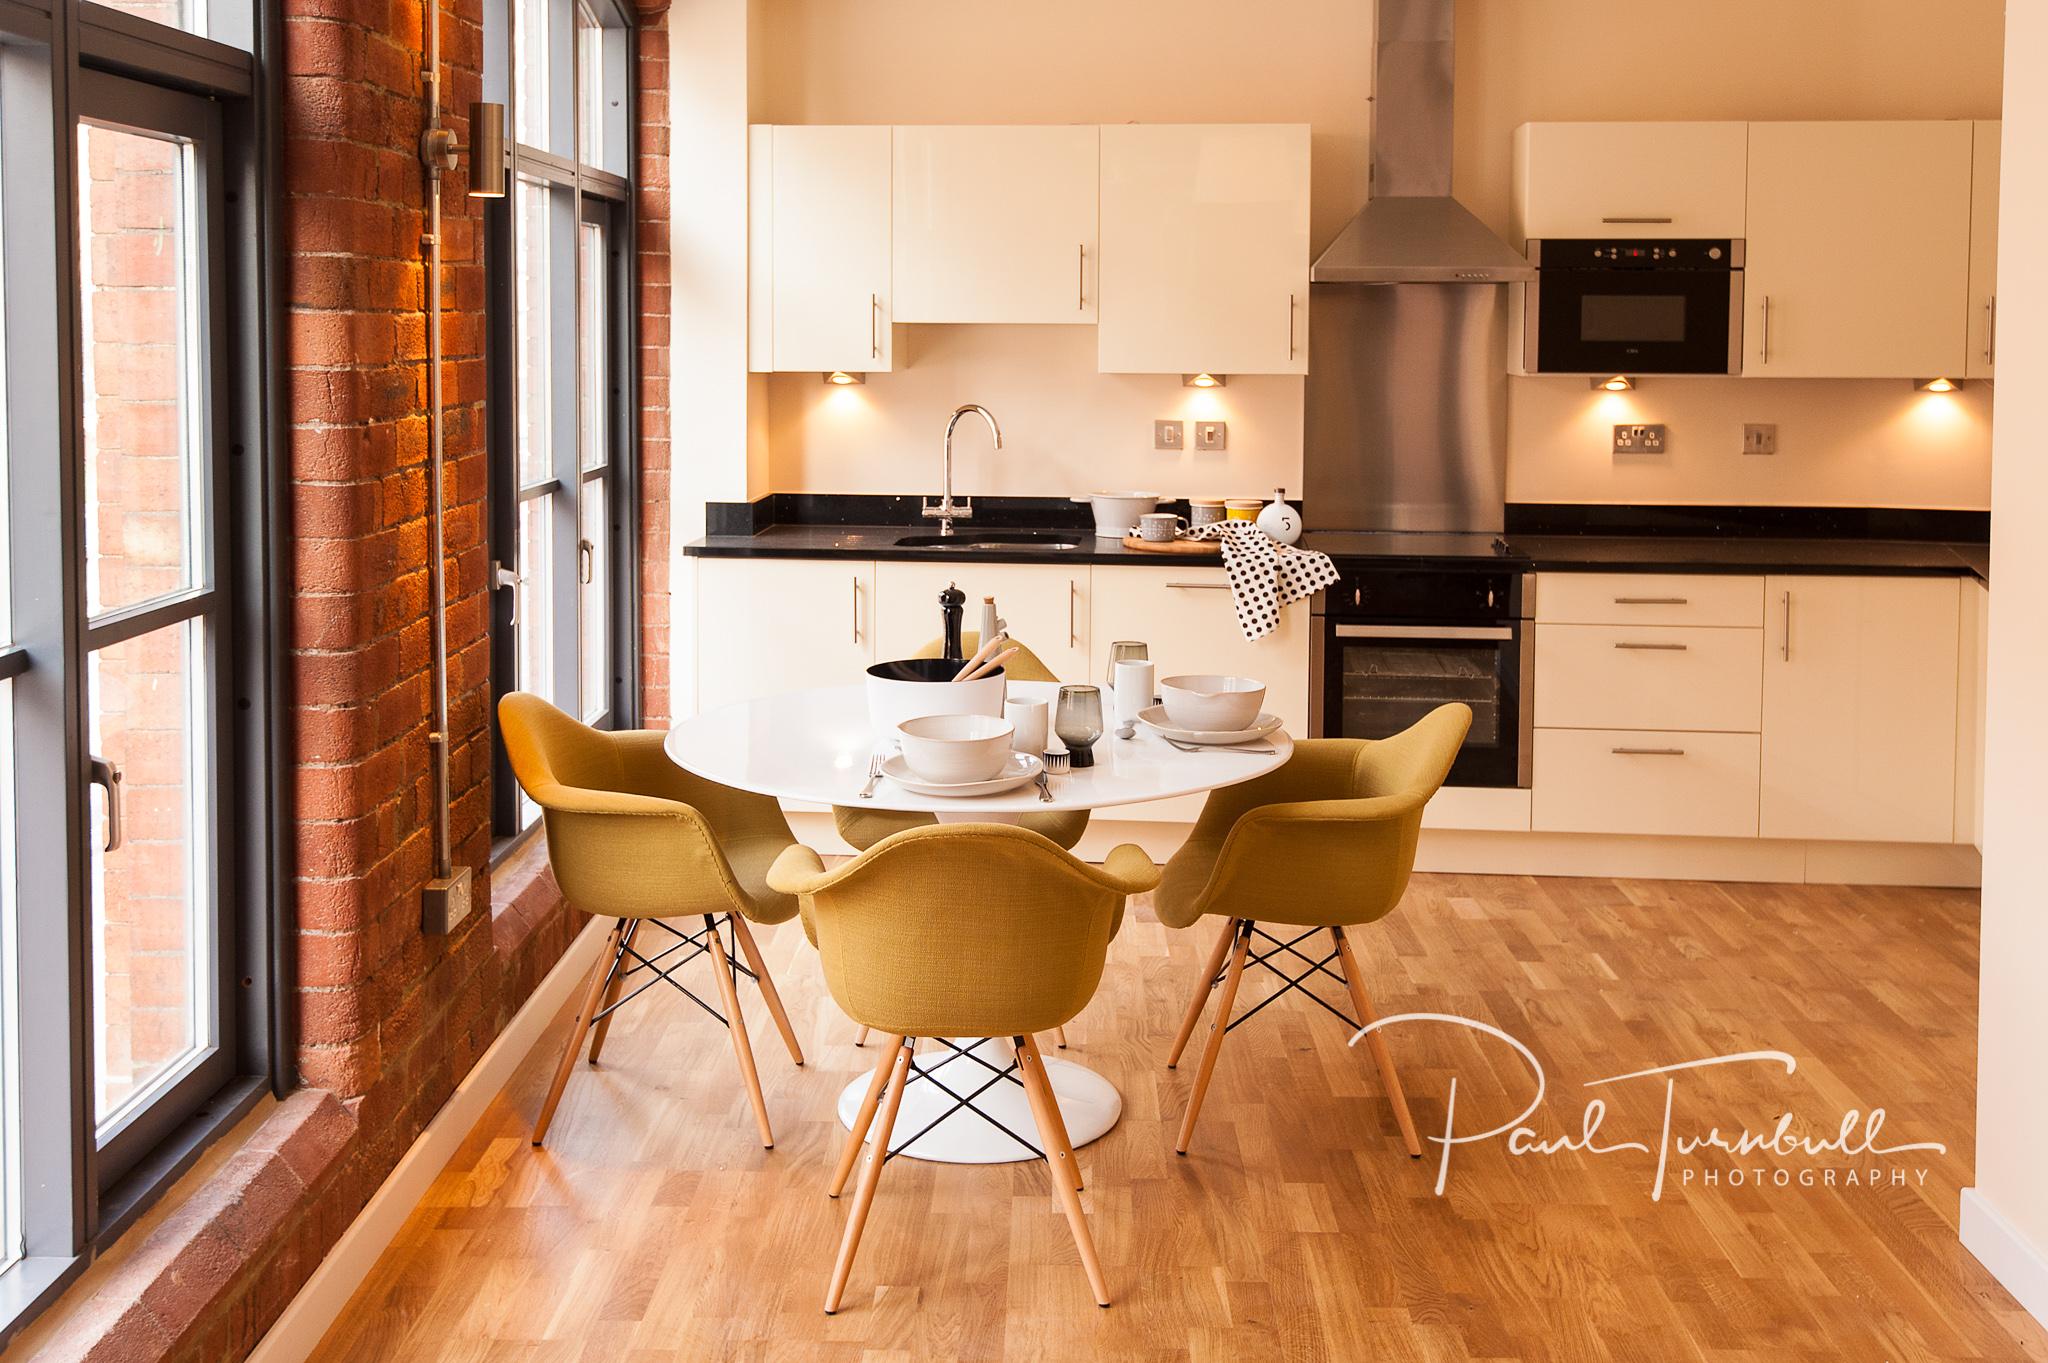 commercial-property-photographer-leeds-yorkshire-blackbrook-developments-048.jpg